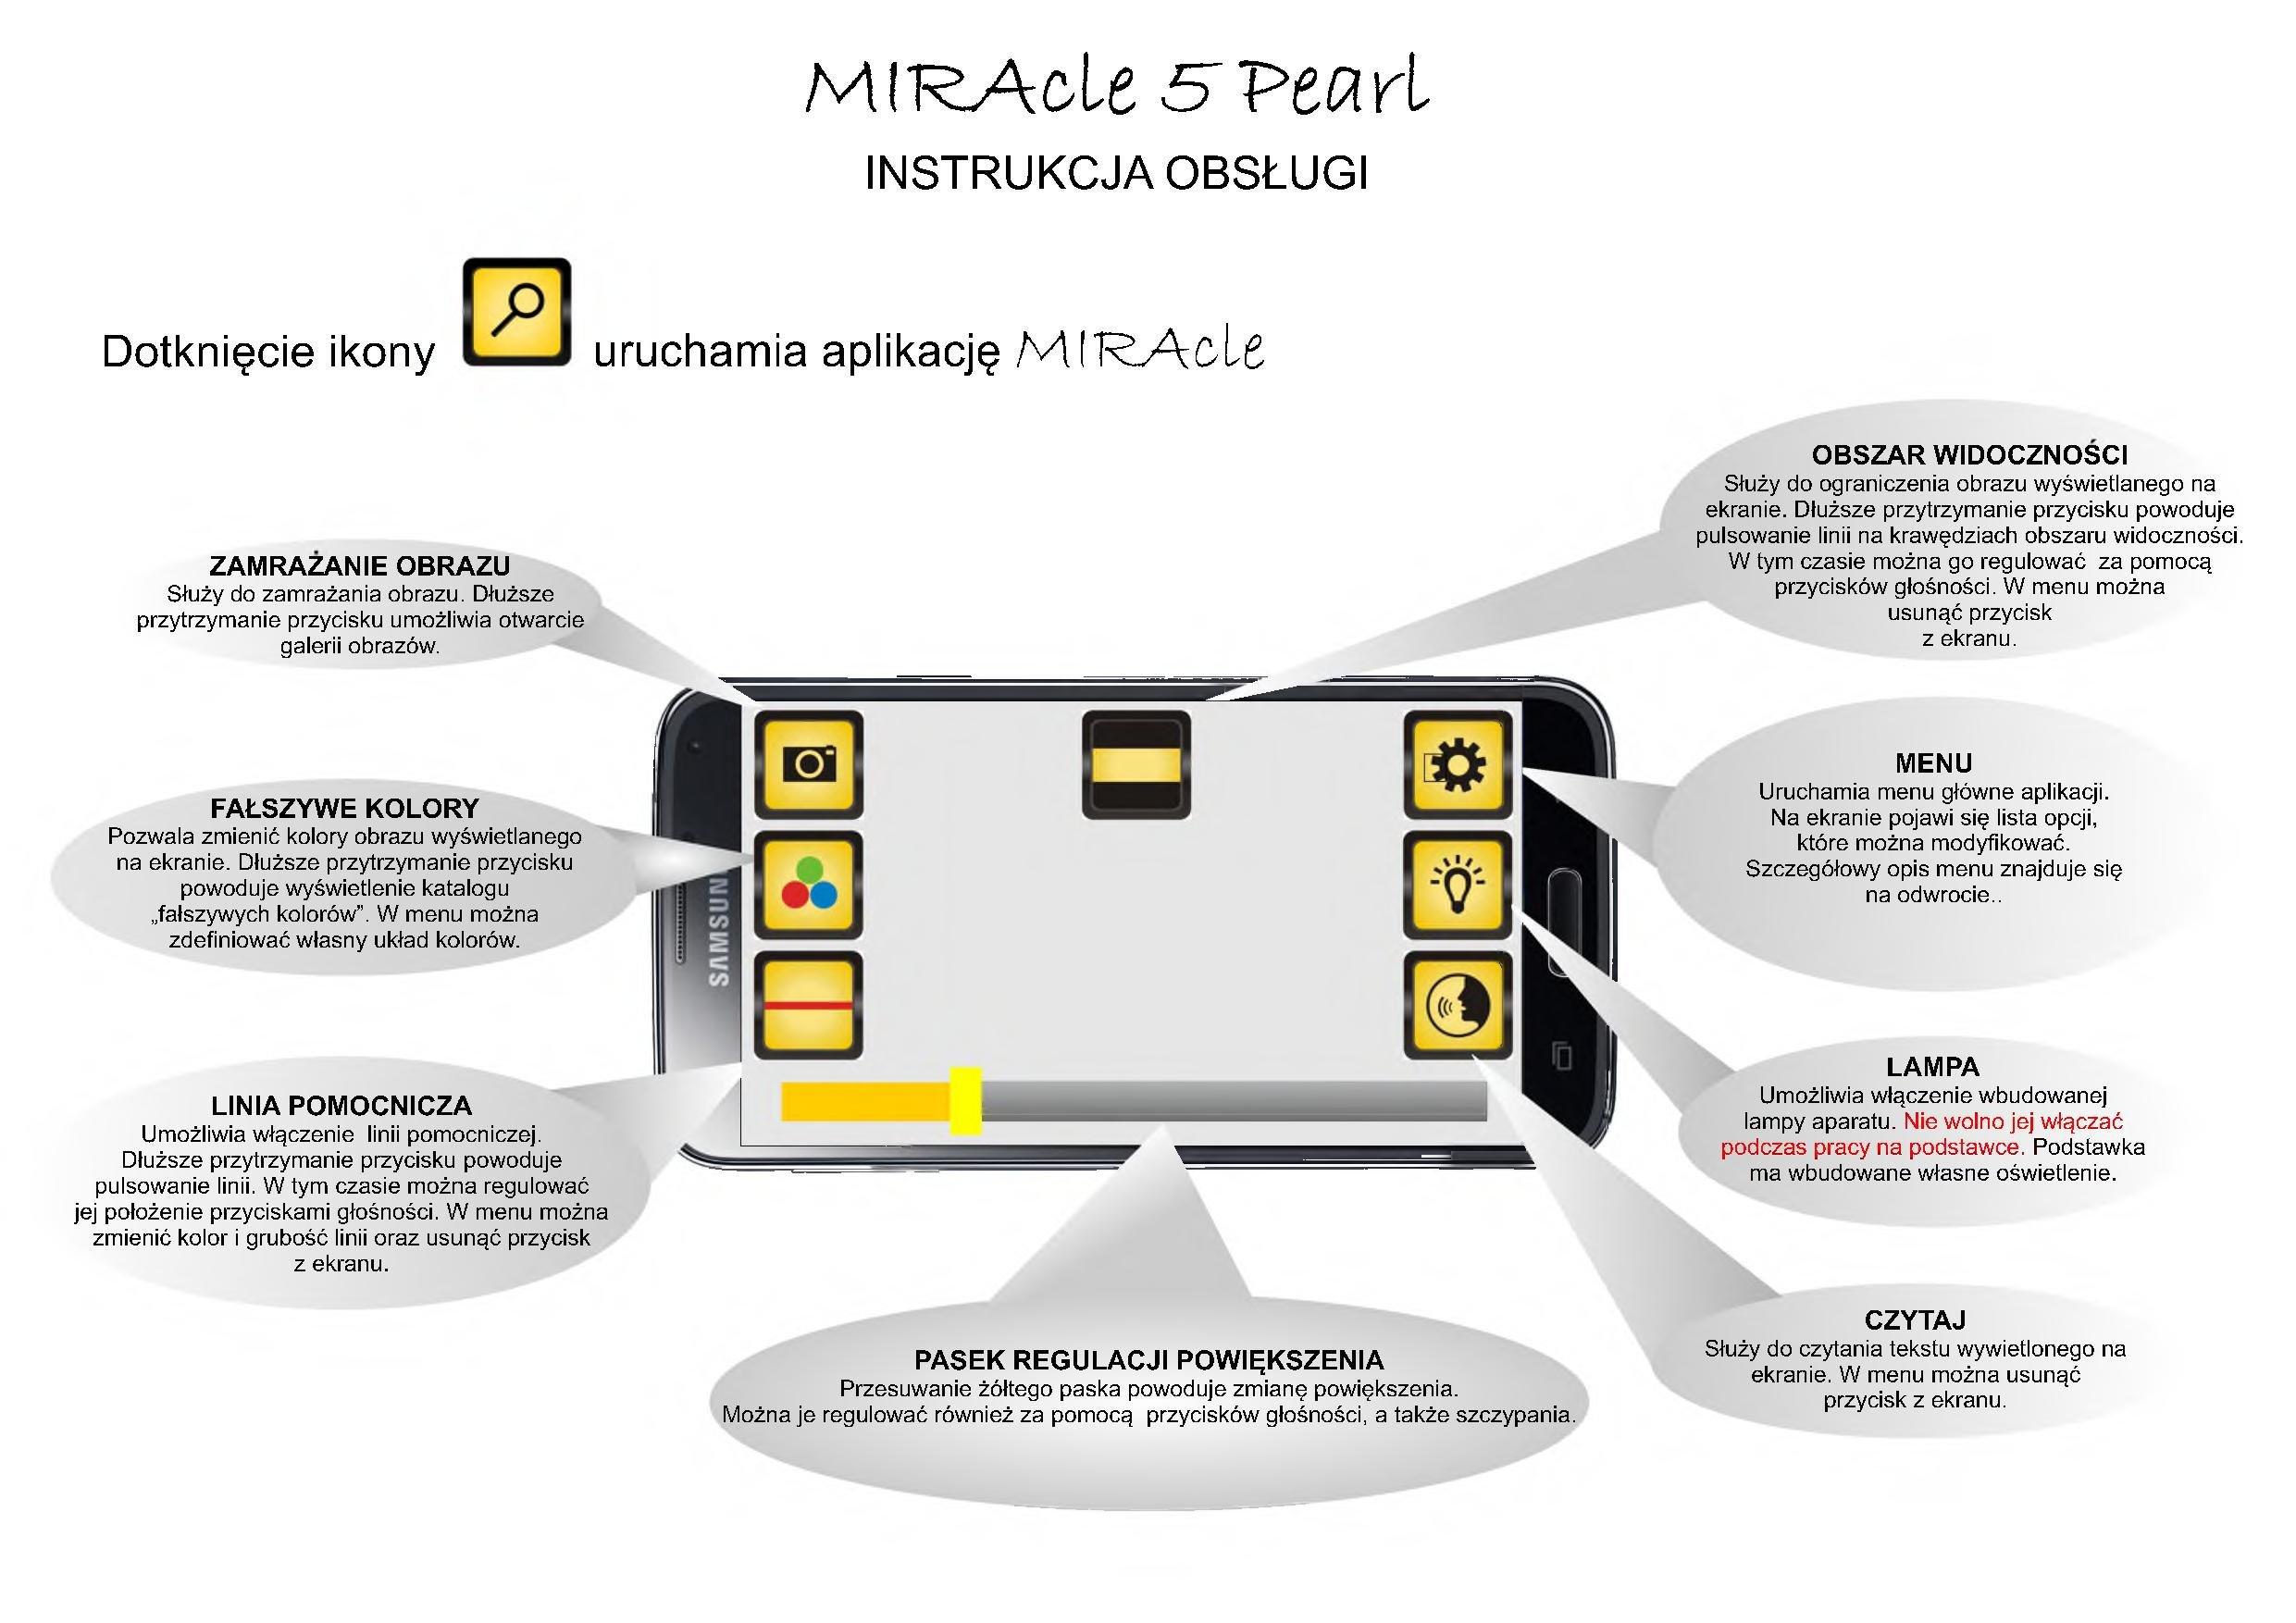 MIRAcle - lupa elektroniczna z telefonem!